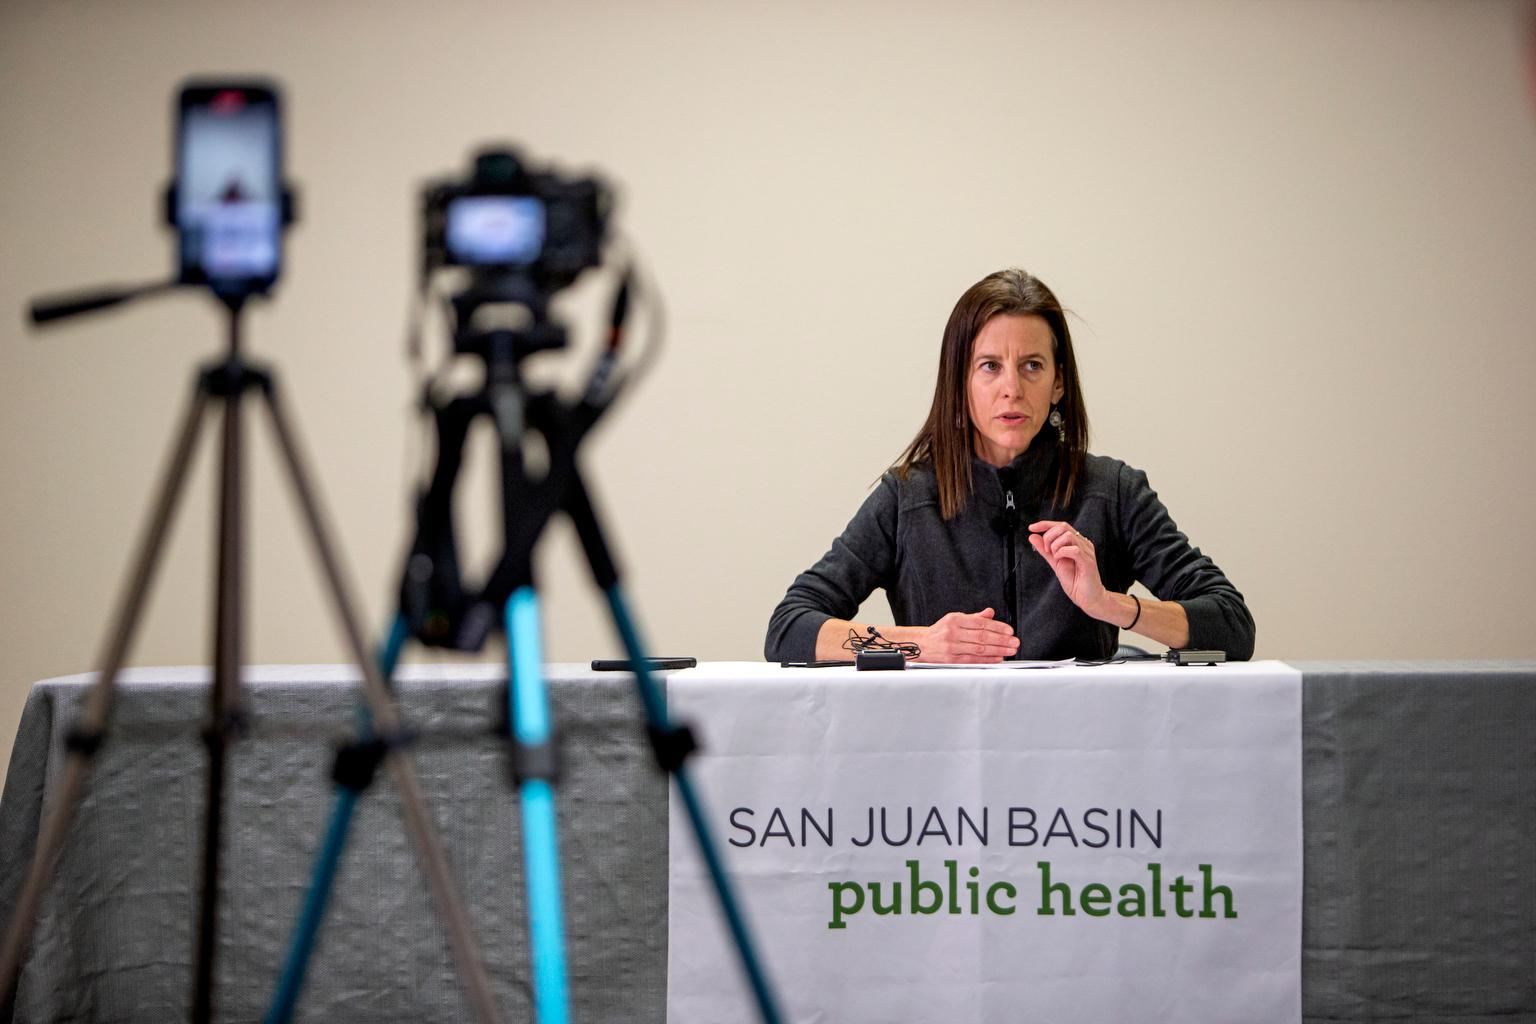 Liane Jollon, director of San Juan Basin Public Health, addresses the media Friday afternoon about their drive through coronavirus testing facility at the La Plata County fairgrounds.